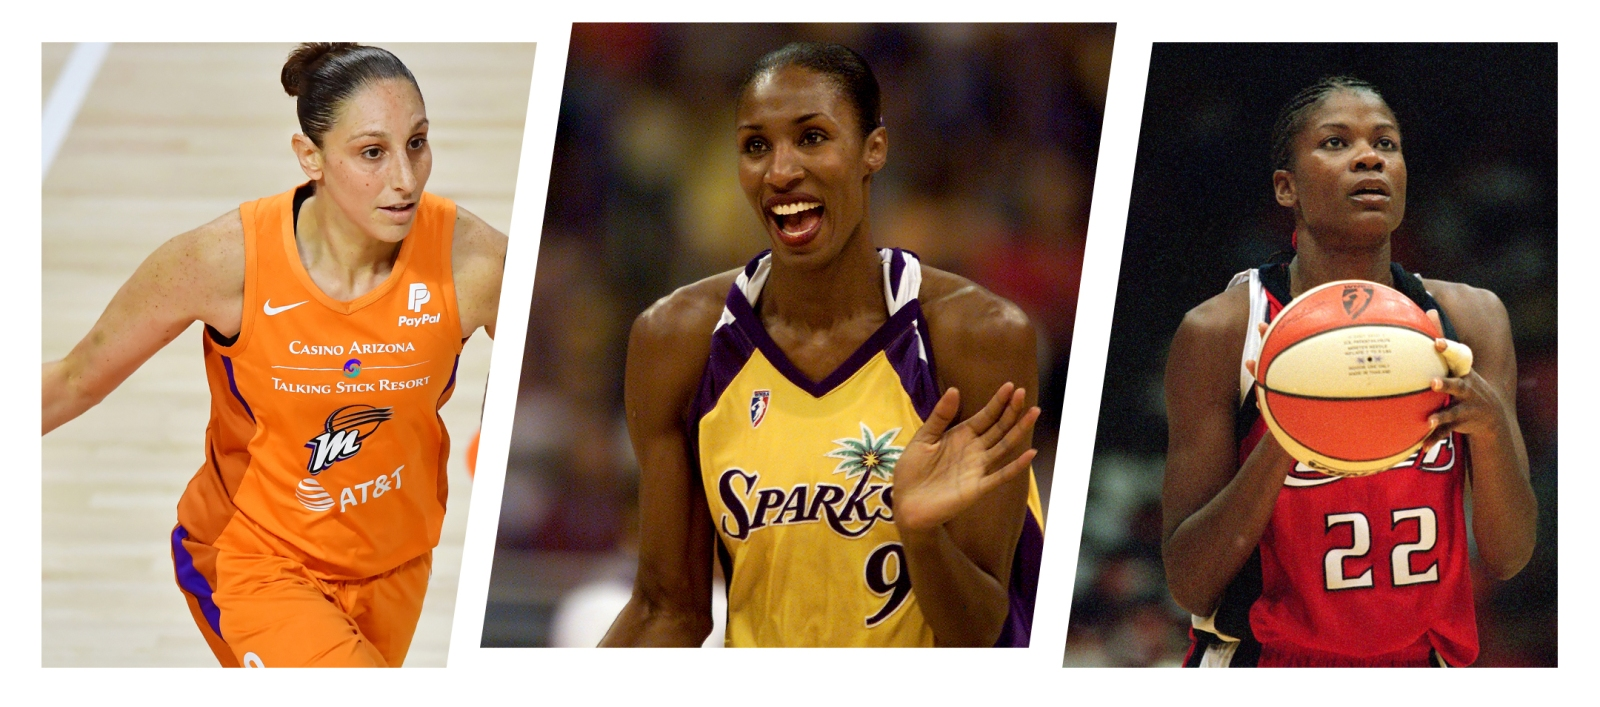 Players straight wnba Former WNBA